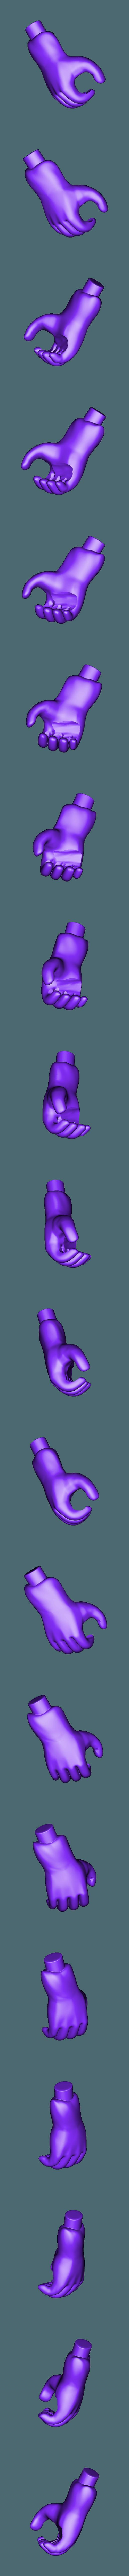 Master_roshi_main_droite.stl Download free STL file Master Roshi Dragon Ball Z • 3D printing object, Gatober